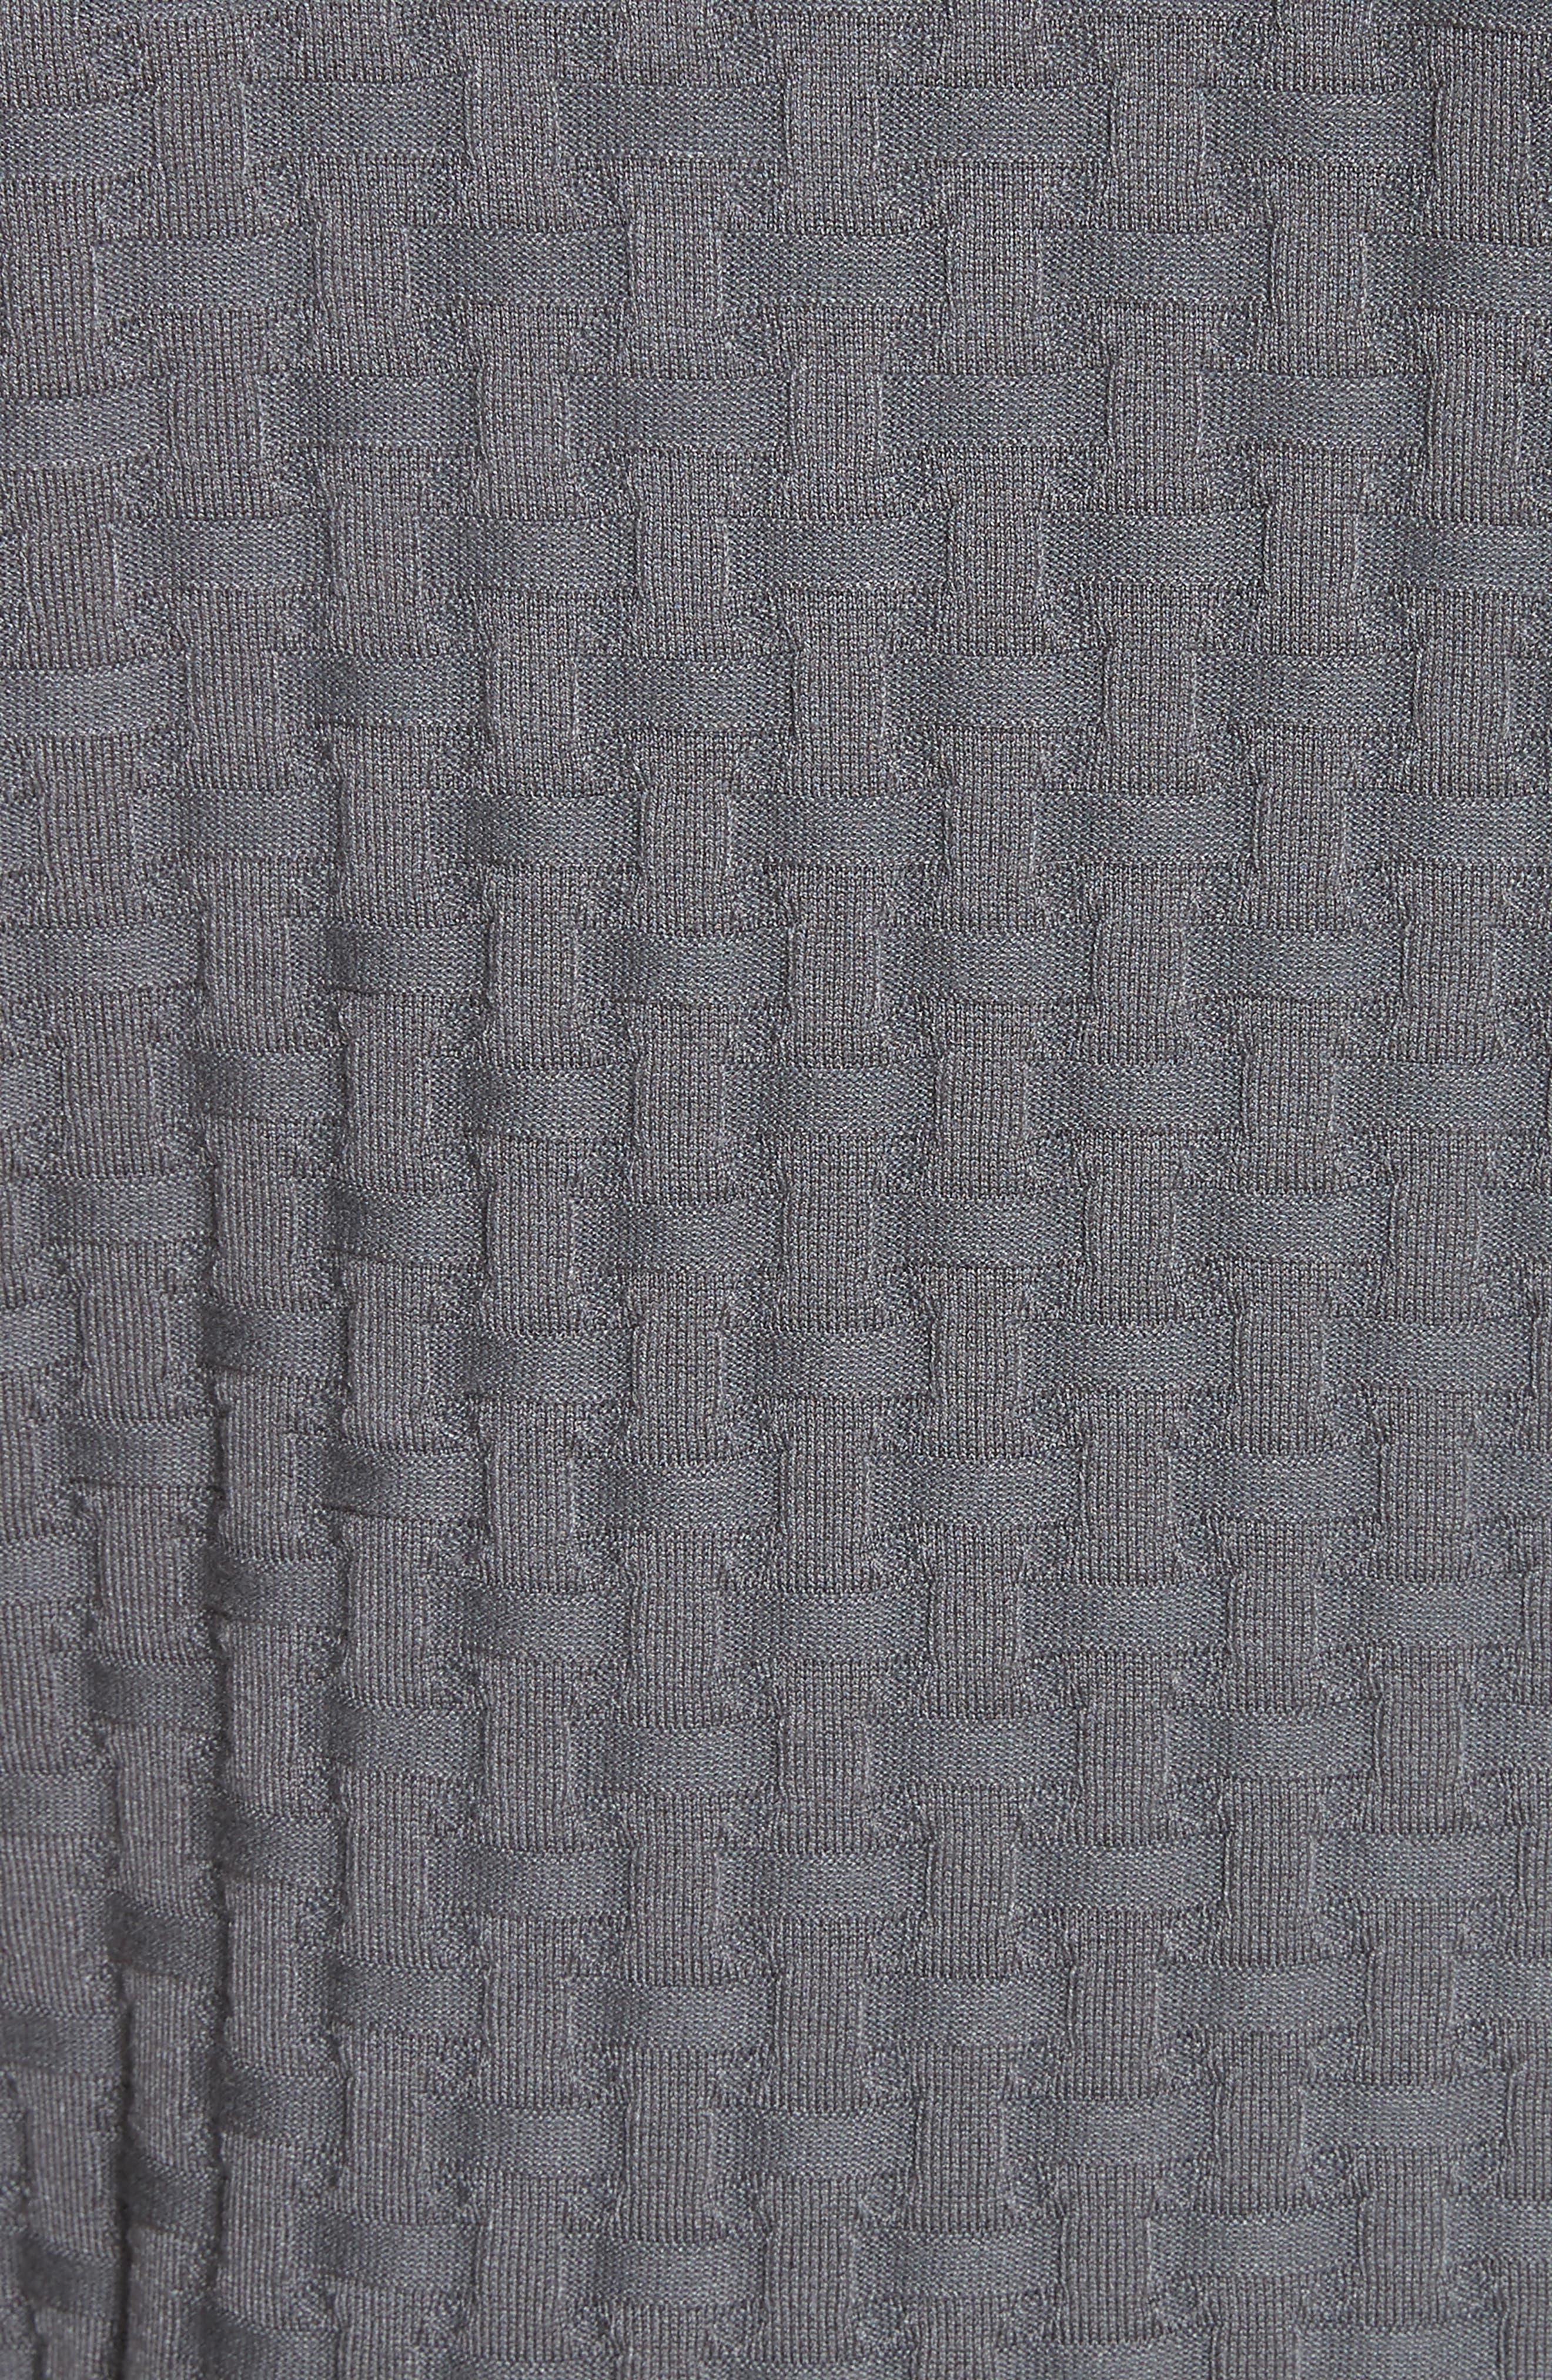 Alternate Image 5  - Emporio Armani Slim Fit Woven Links Sweater